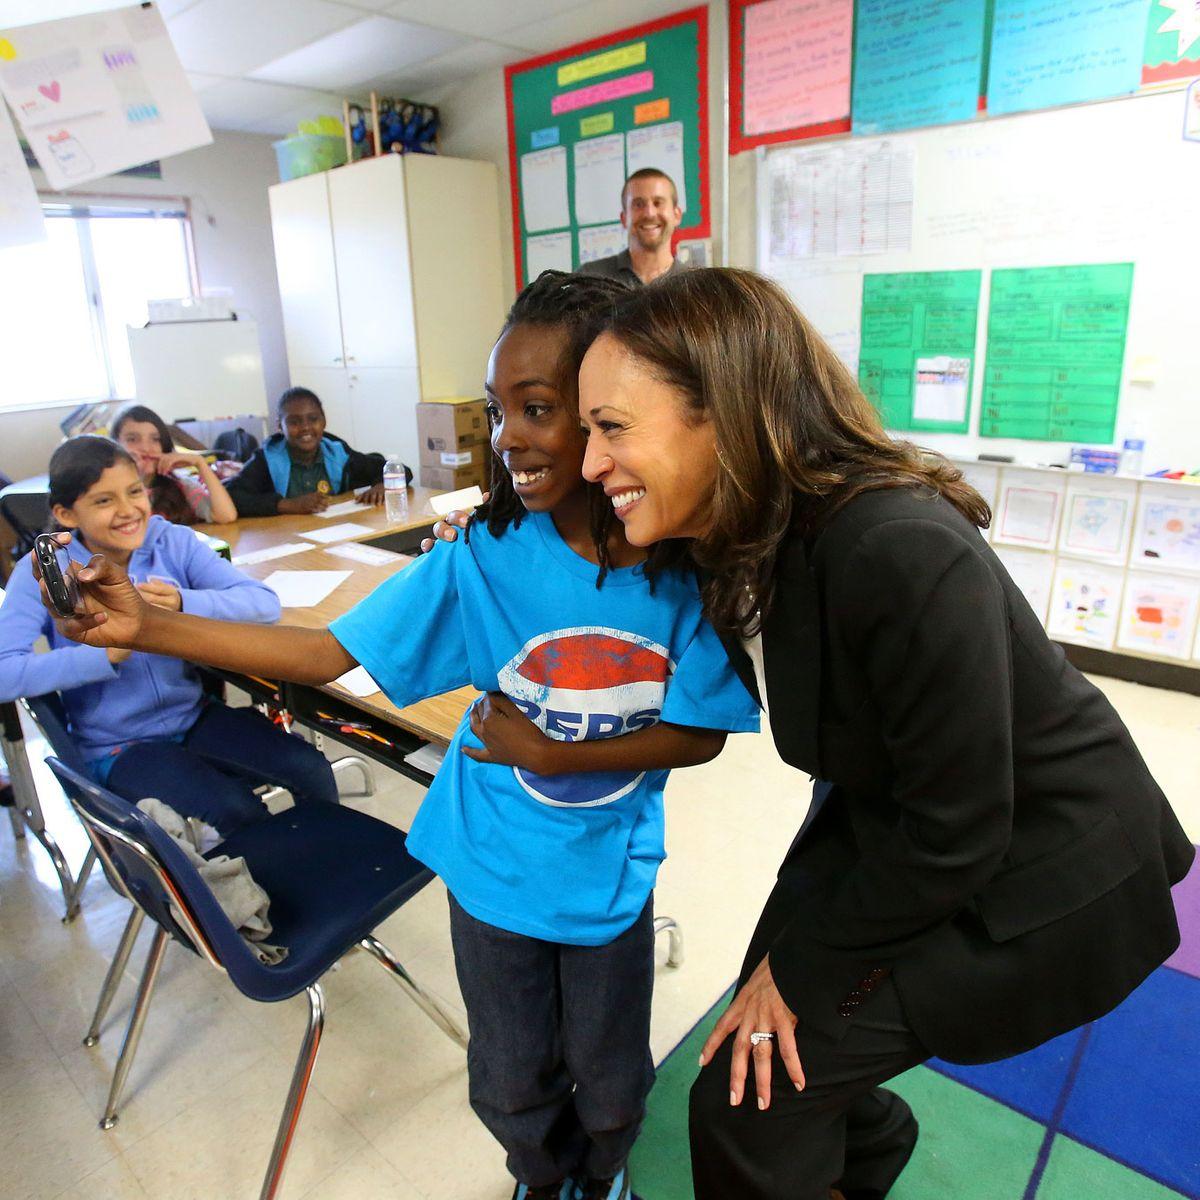 Harris Admits Evil Neoliberal Scheme To Educate Poor Kids